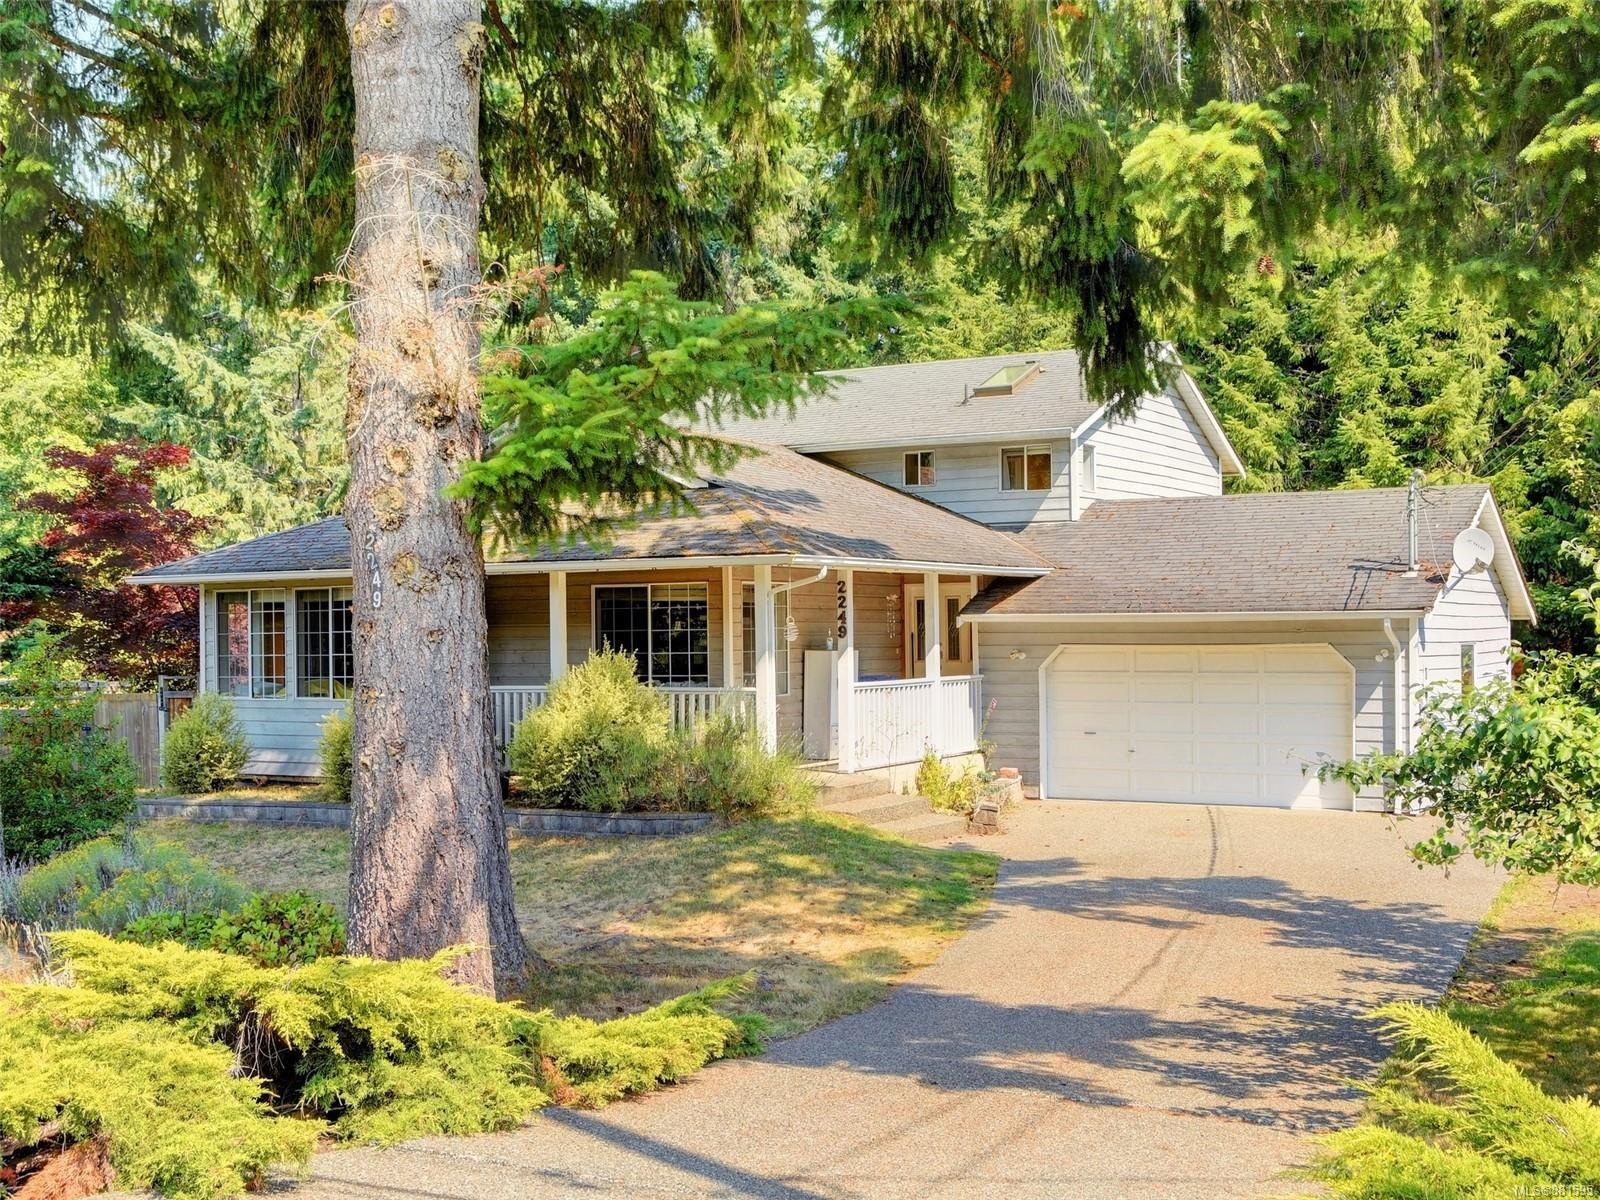 Main Photo: 2249 McIntosh Rd in : ML Shawnigan House for sale (Malahat & Area)  : MLS®# 881595